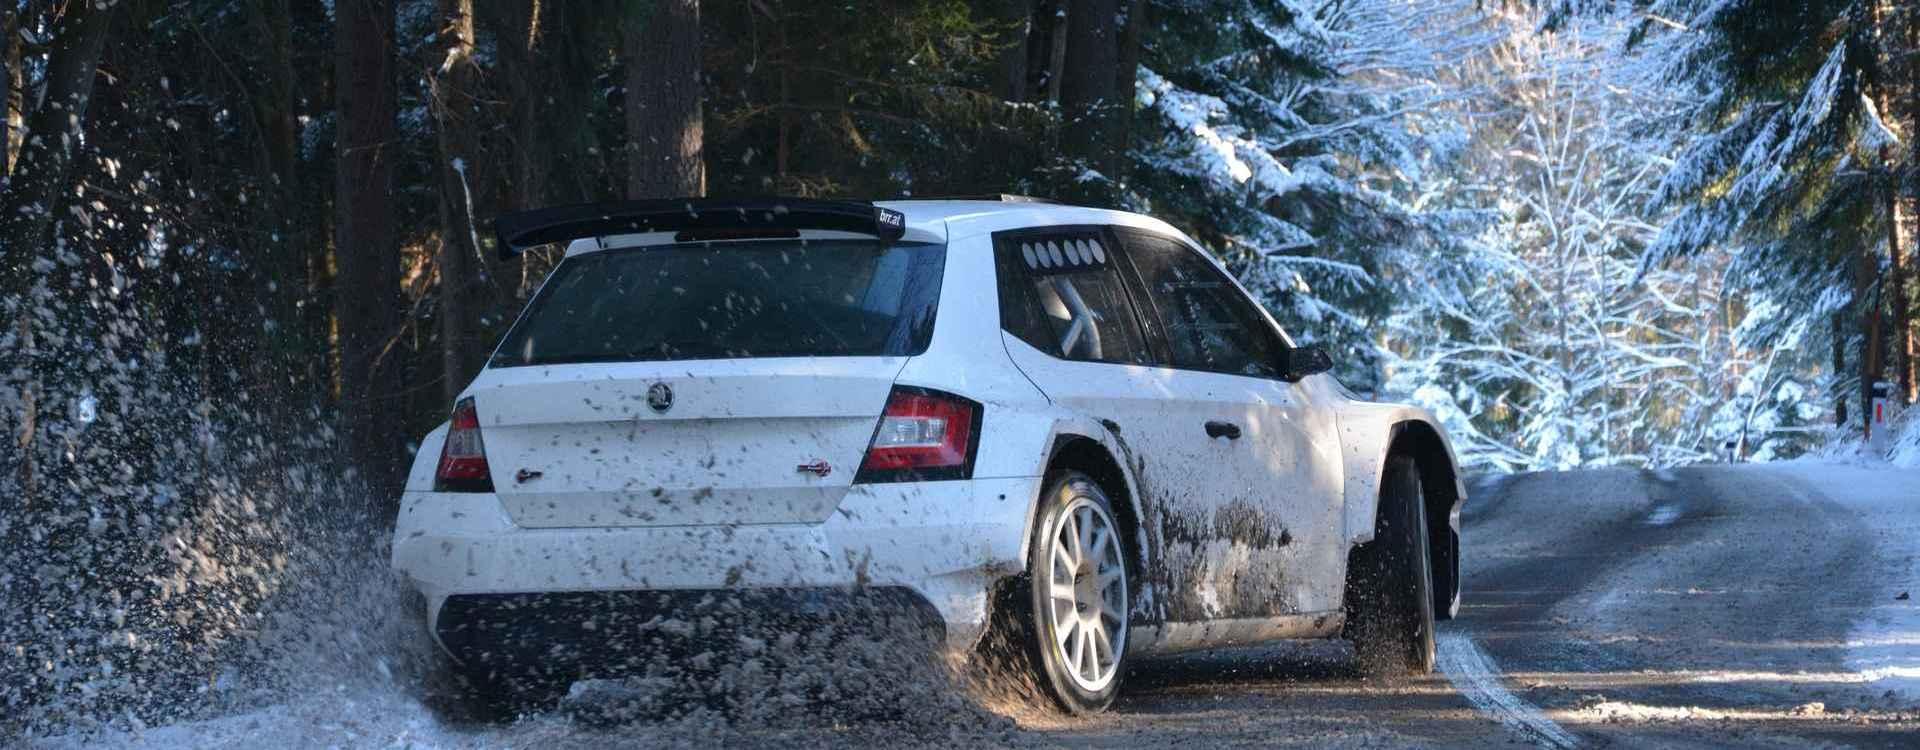 Monte Carlo Rally Preview: Seven ŠKODA Fabia R5 cars Entered